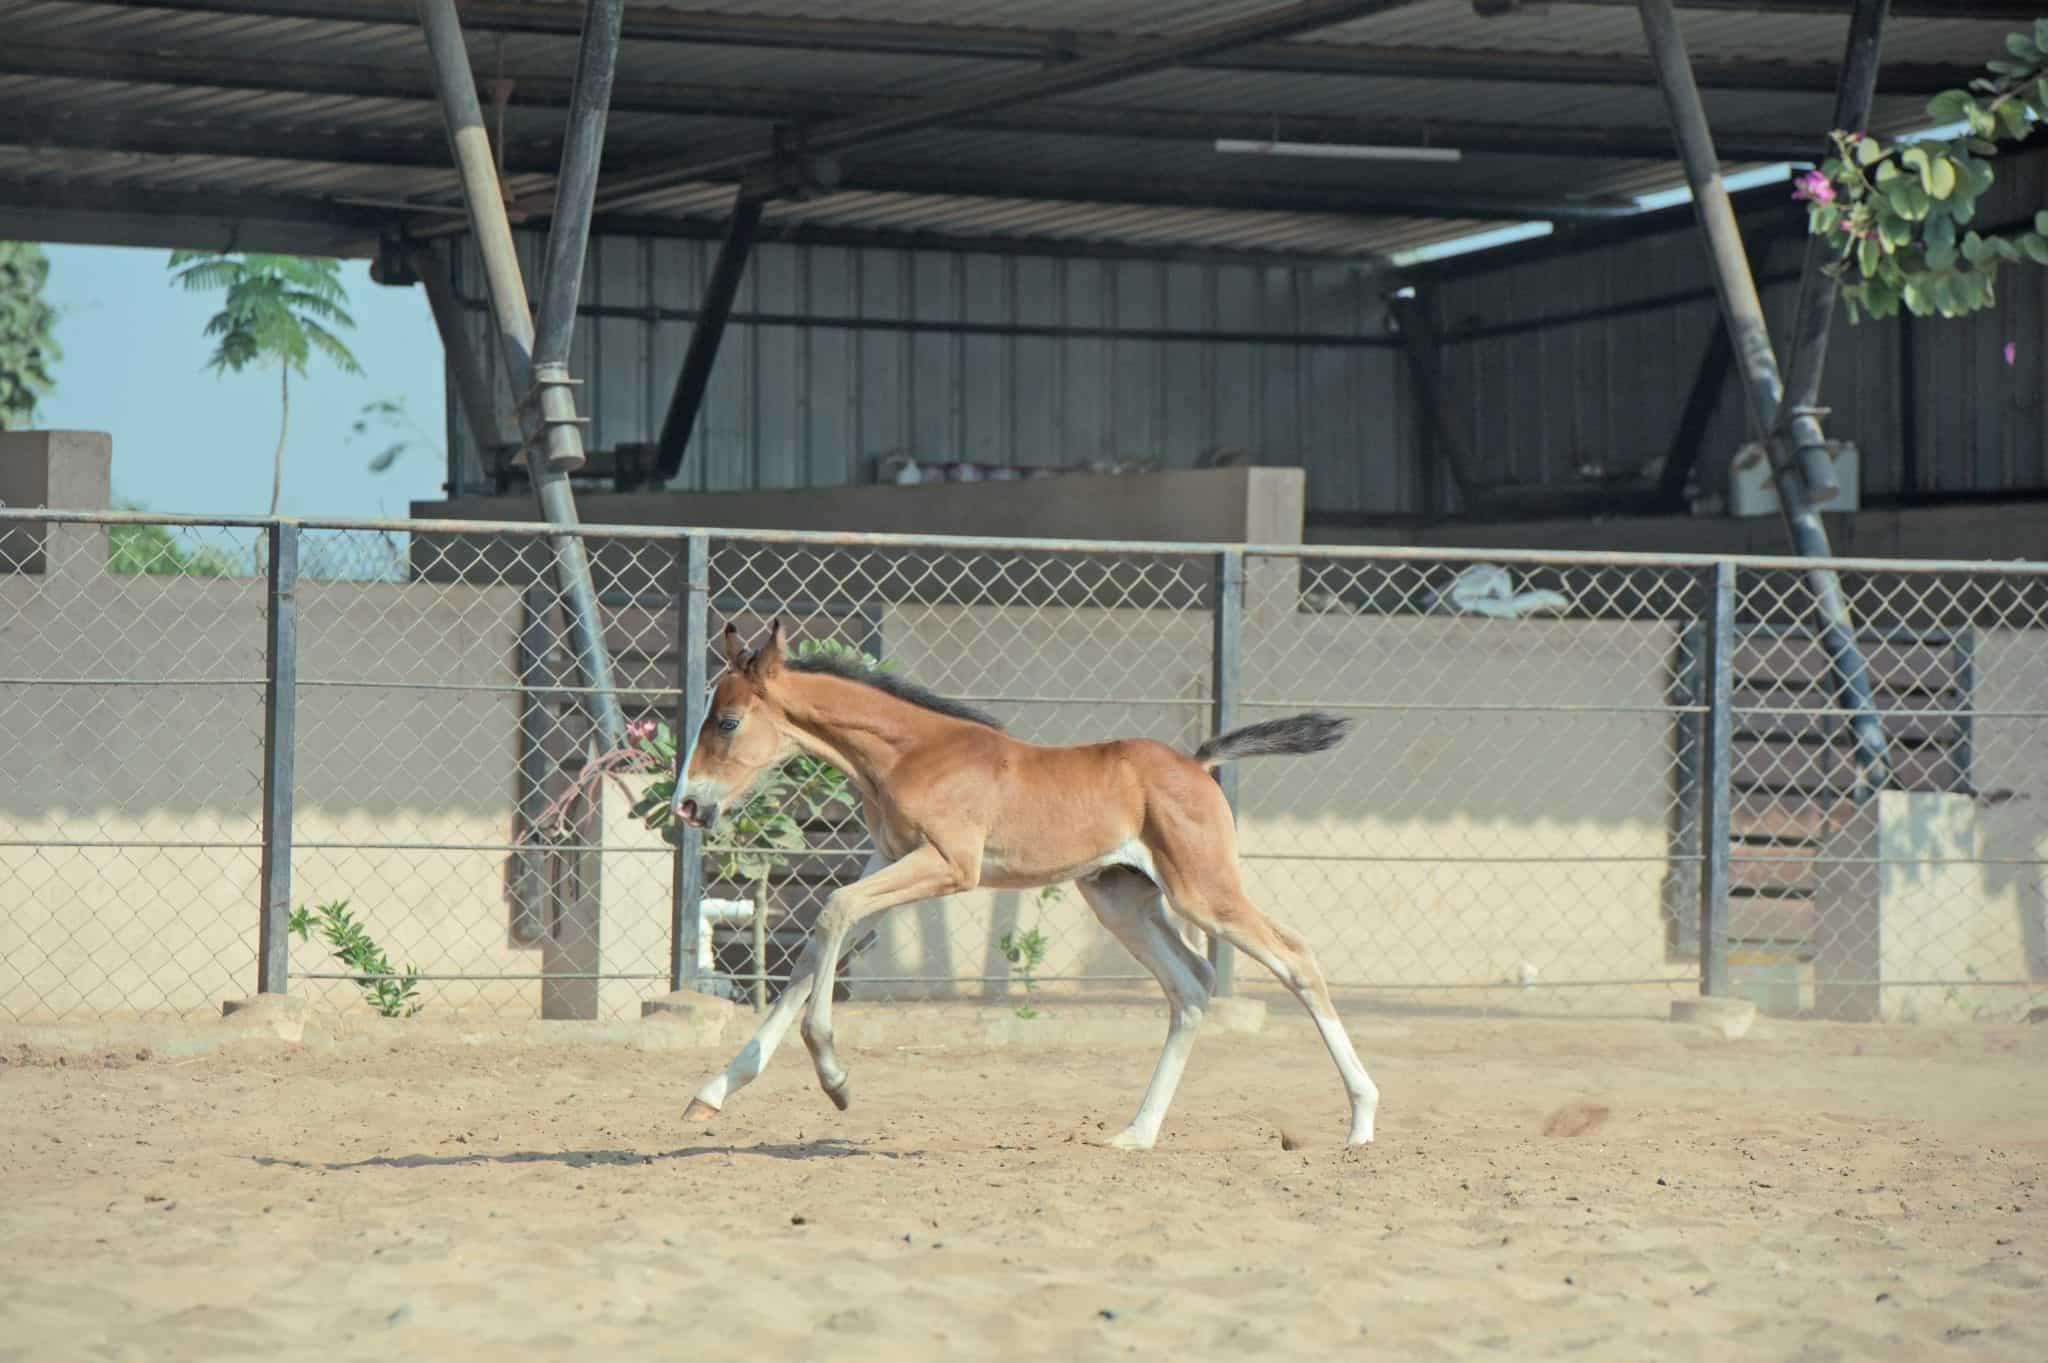 running Marwari horse chestnut colt in paddock. India